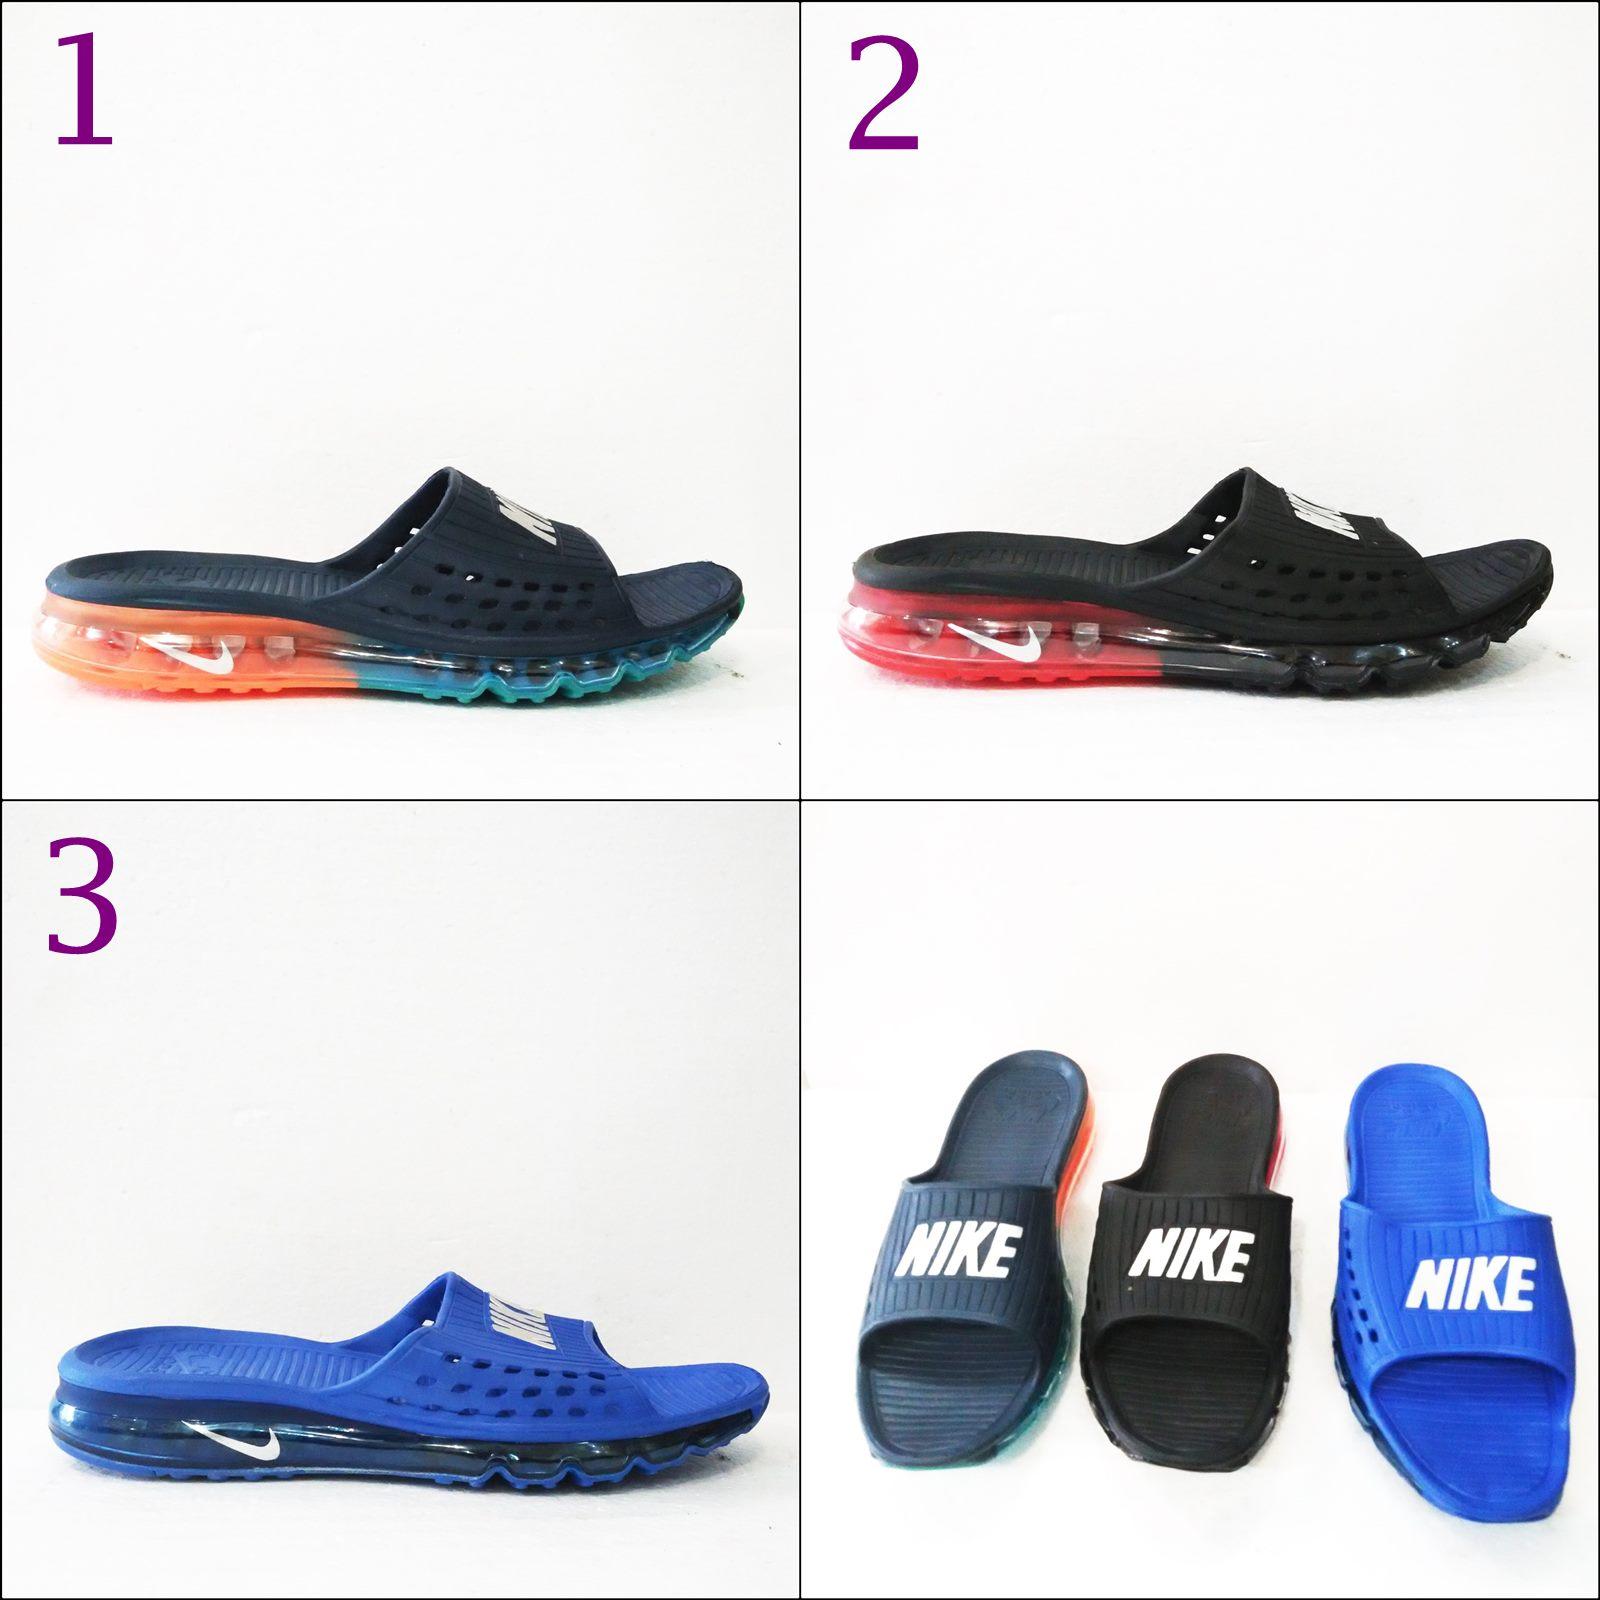 Shoes Tabung Balabala Nike Jual Cowok Airmax Qe6yany Sendal Full AL5jR4